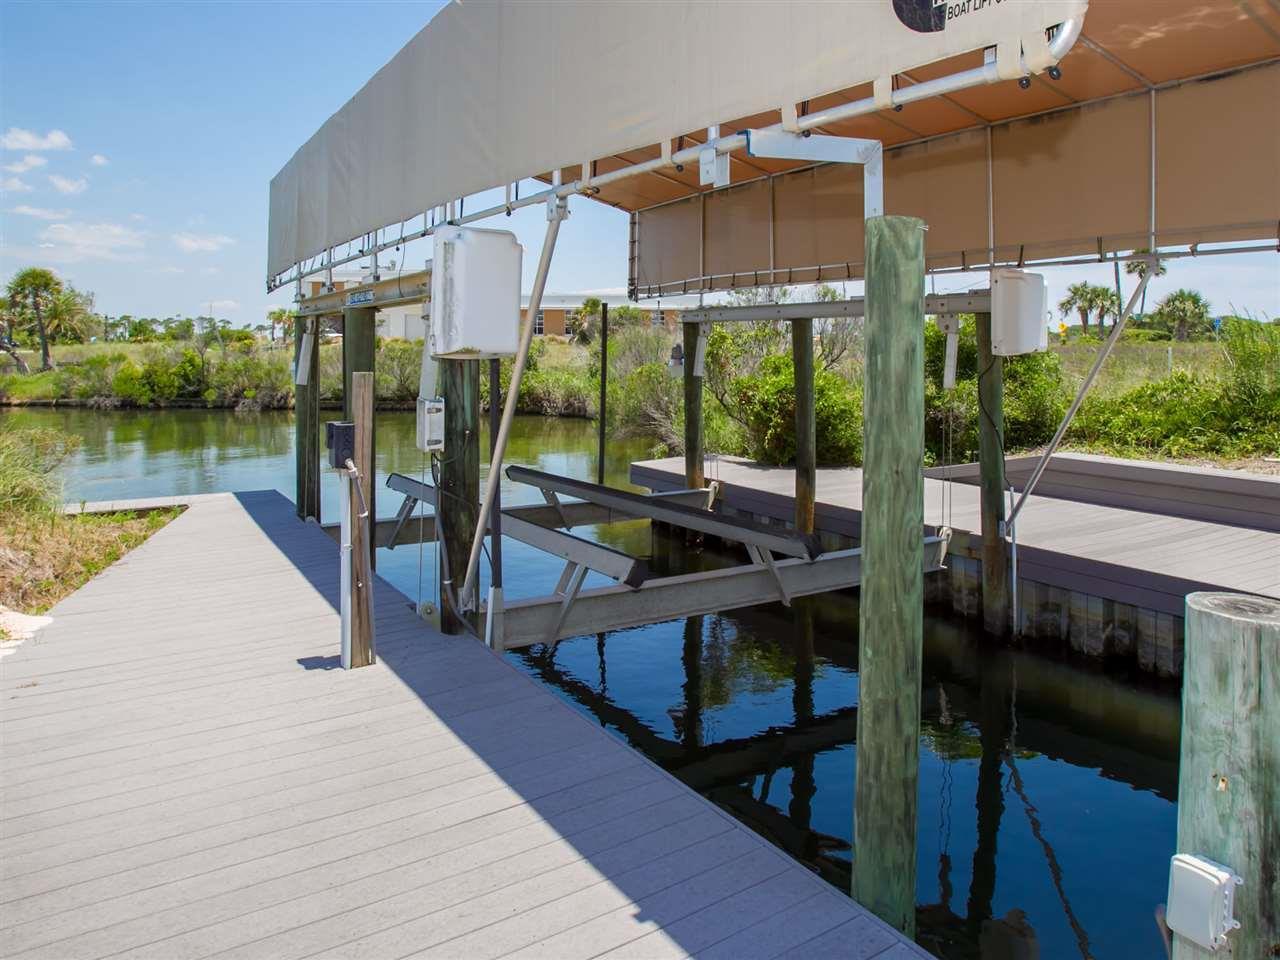 7292 Captain Kidd Reef, Perdido Key, FL 32507